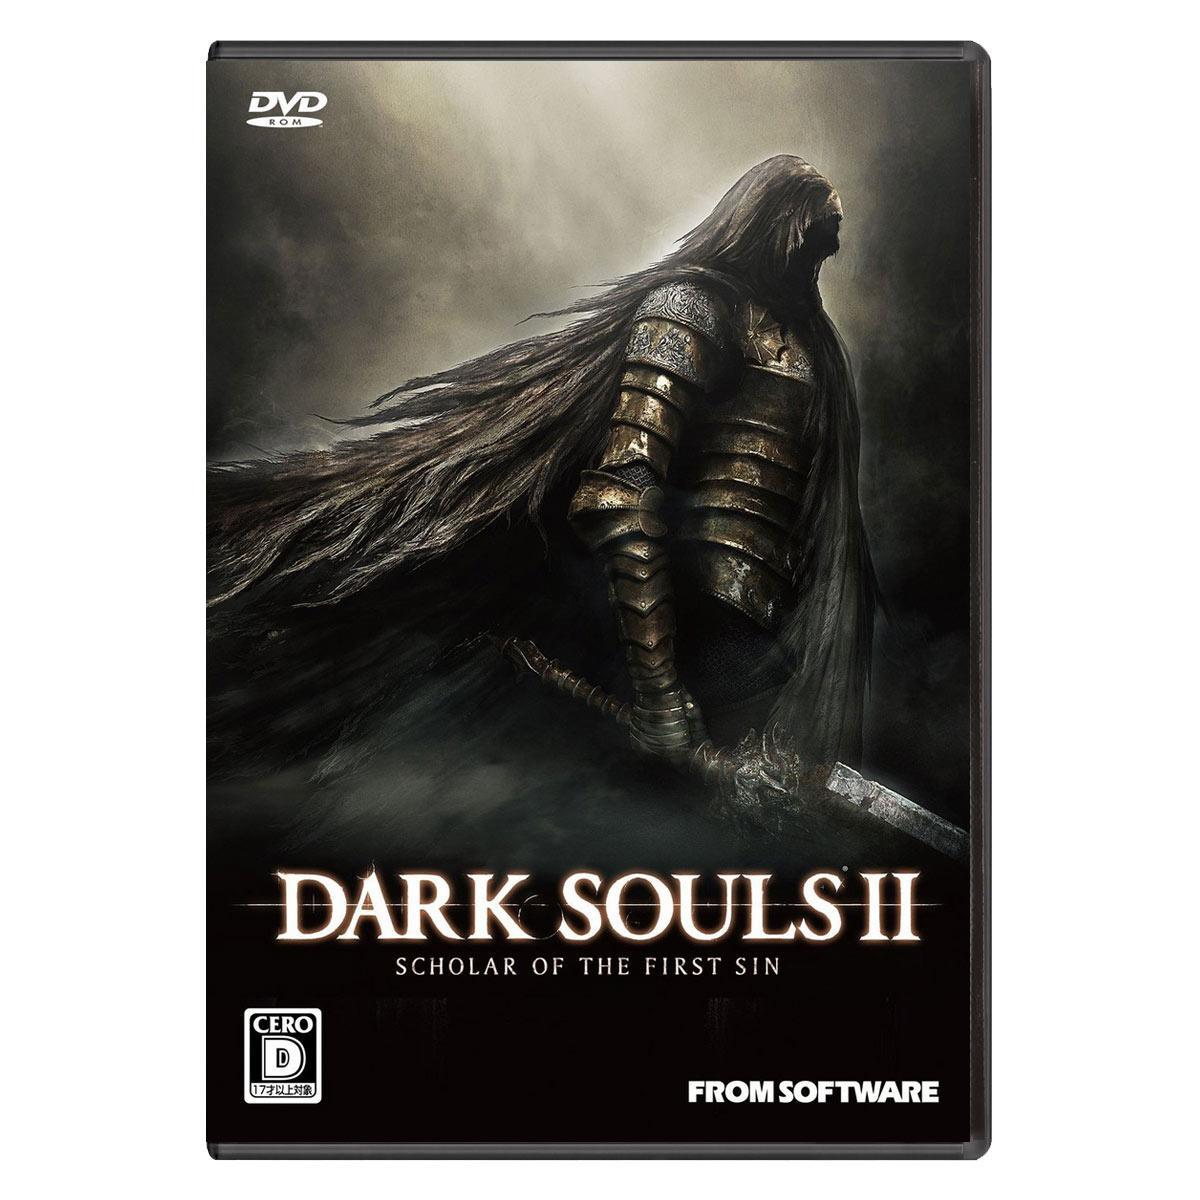 Dark Souls II Scholar of the First Sin sur PC